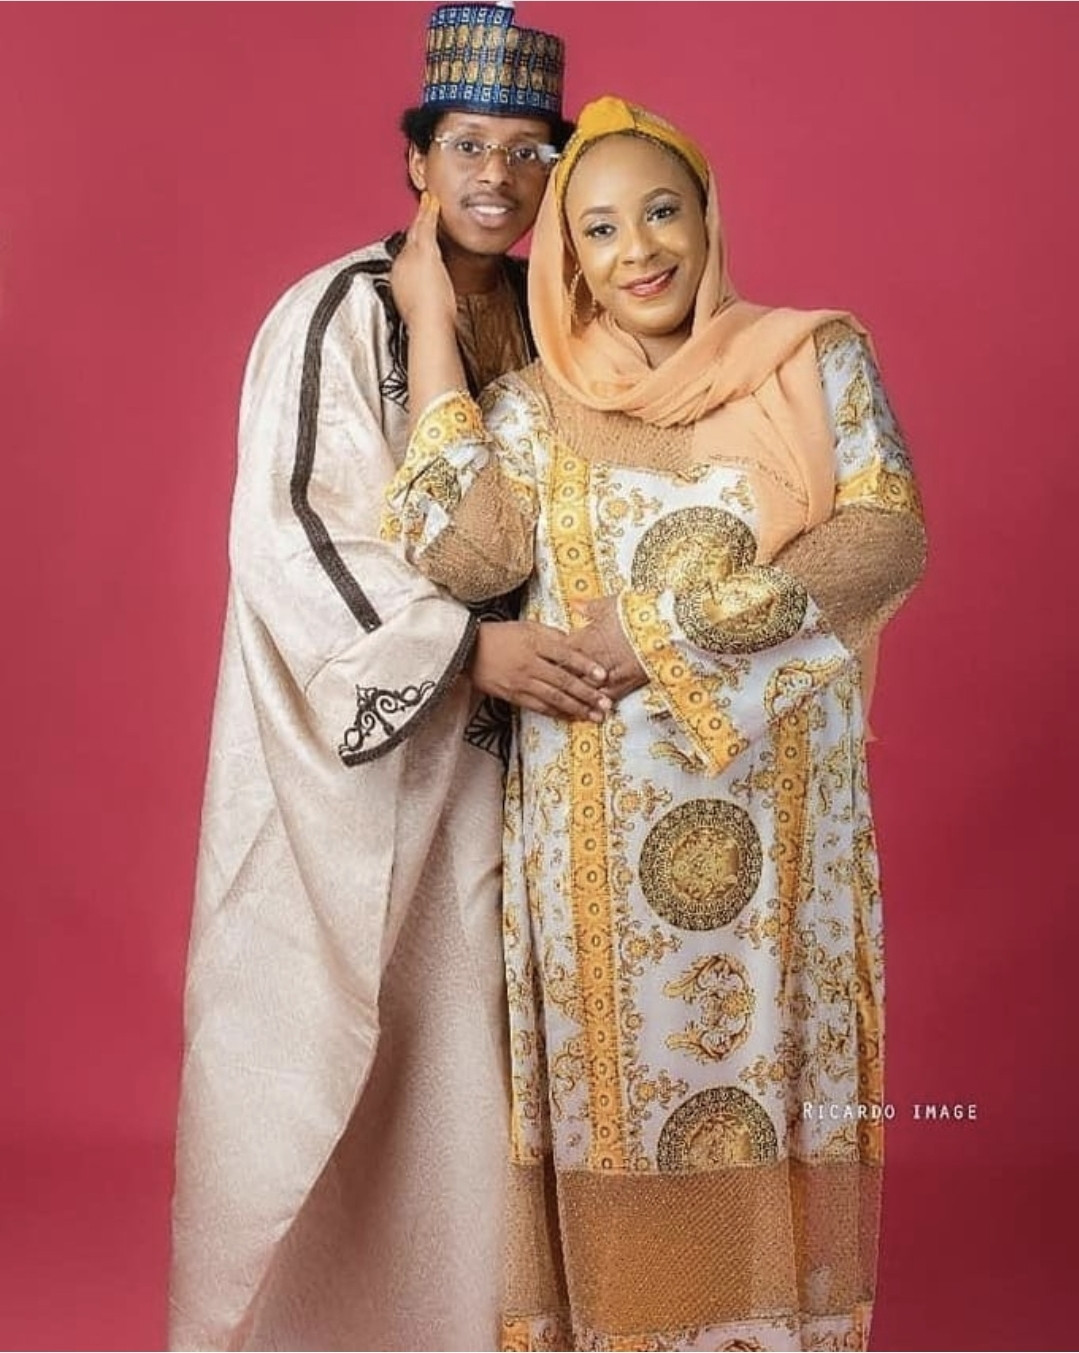 45-Year-Old Female Politician, Jamila Babuba Marries 23-Year-Old Man In Adamawa [Photos] 4